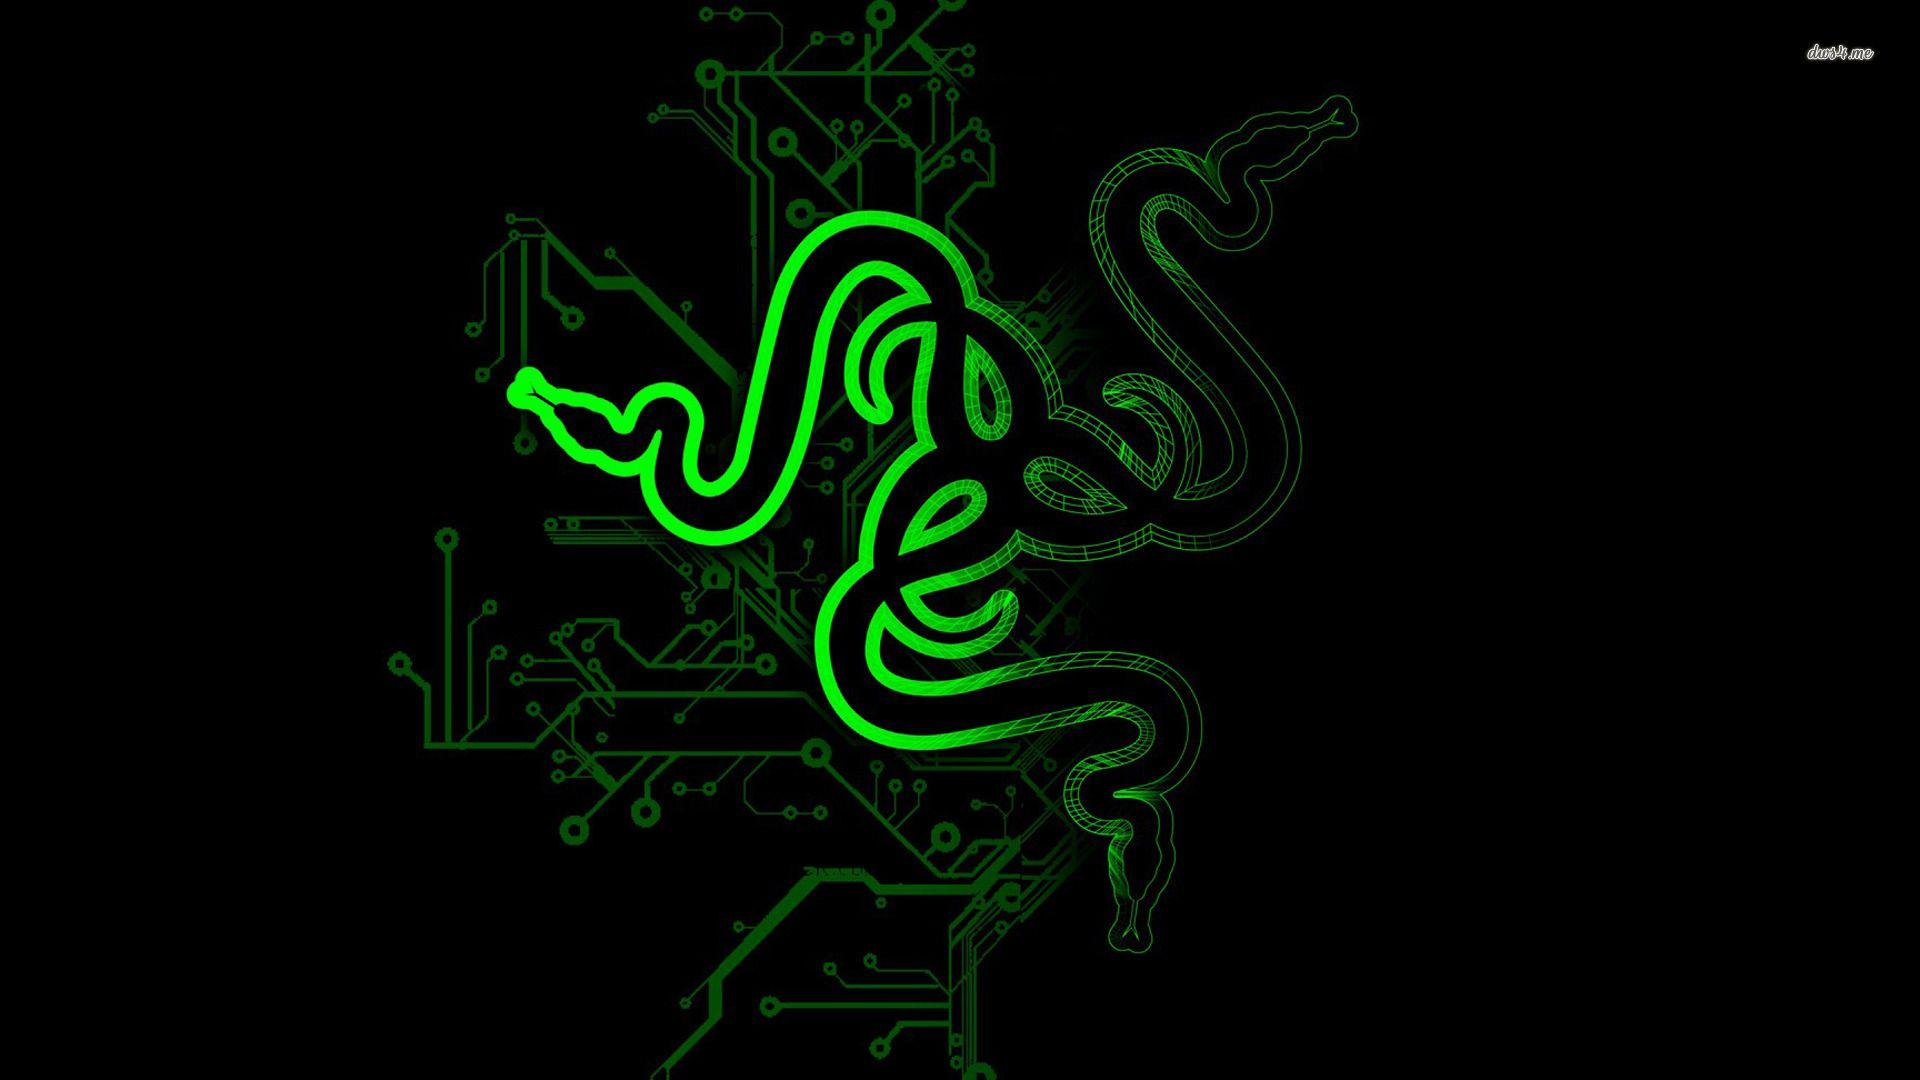 Pin by Roel Wamelink on logo´s Pinterest Logos